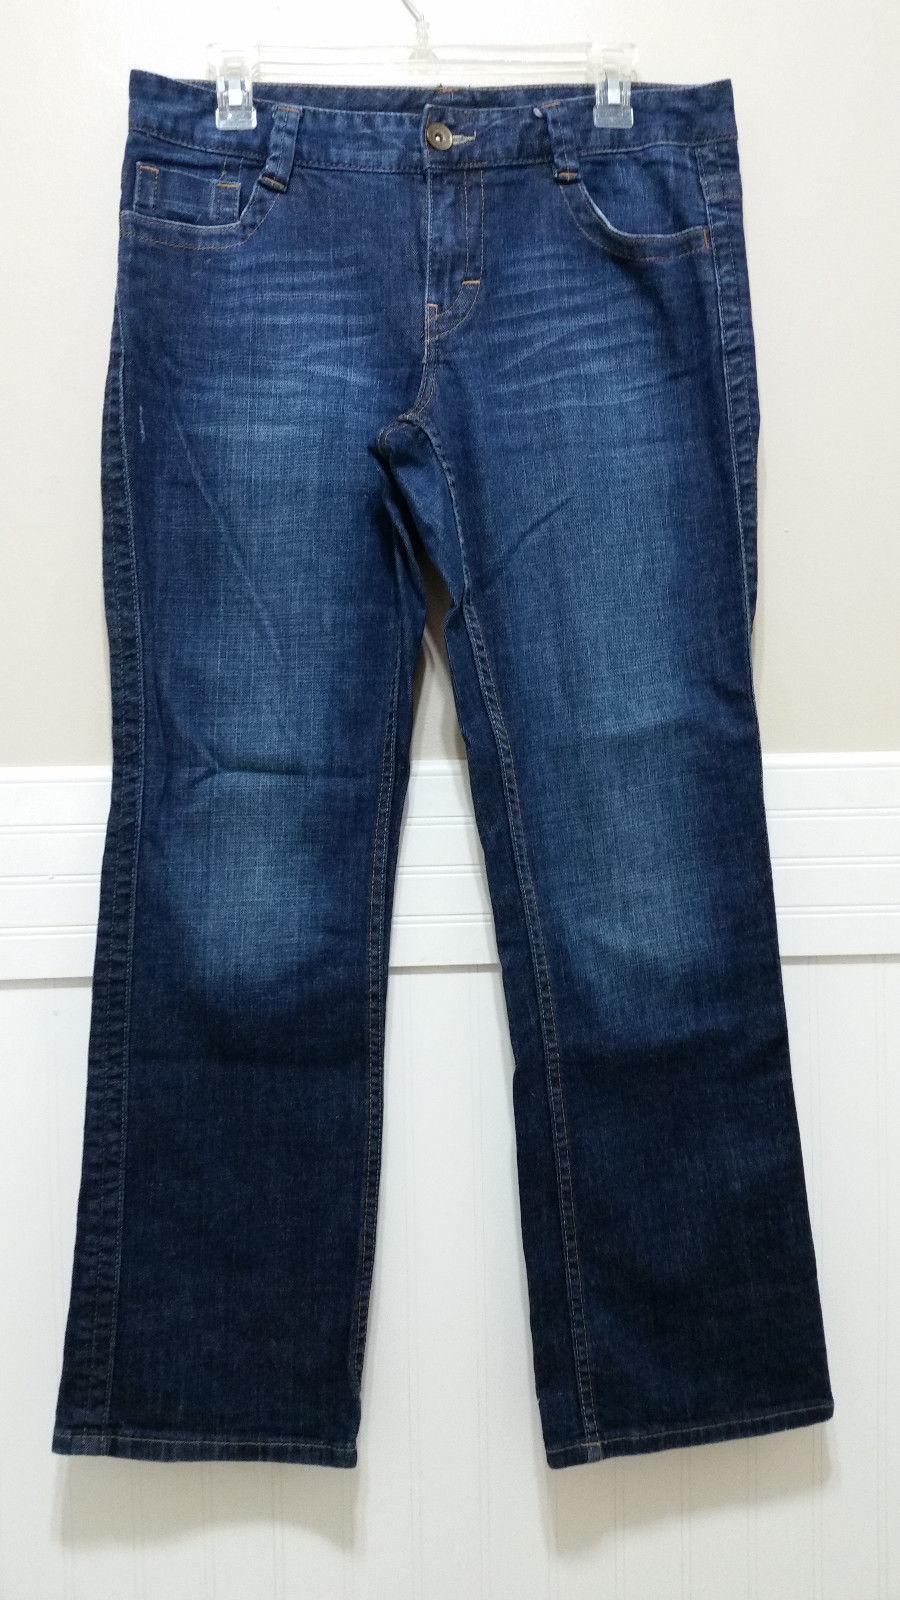 f57103ef94 S l1600. S l1600. Previous. CALVIN KLEIN Jeans Ladies Sz 10 Lean Bootcut  Dark Wash Faded Blue Denim Pants